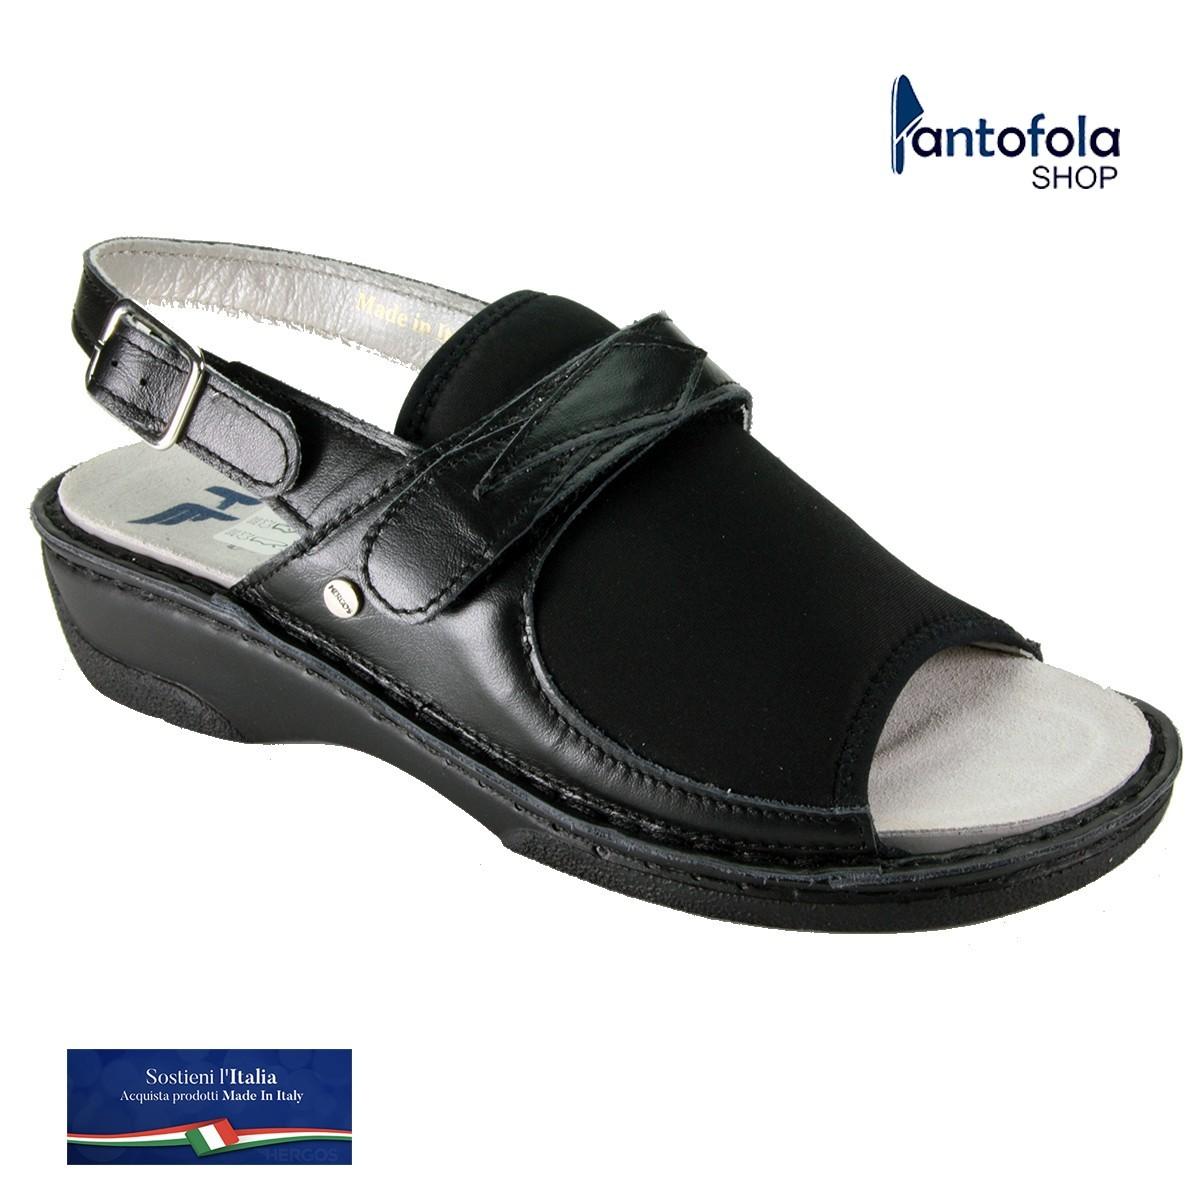 Hergos H 151 Nero Setaelast - Novità 2020 - Sandalo comodo per alluce valgo - Vera pelle